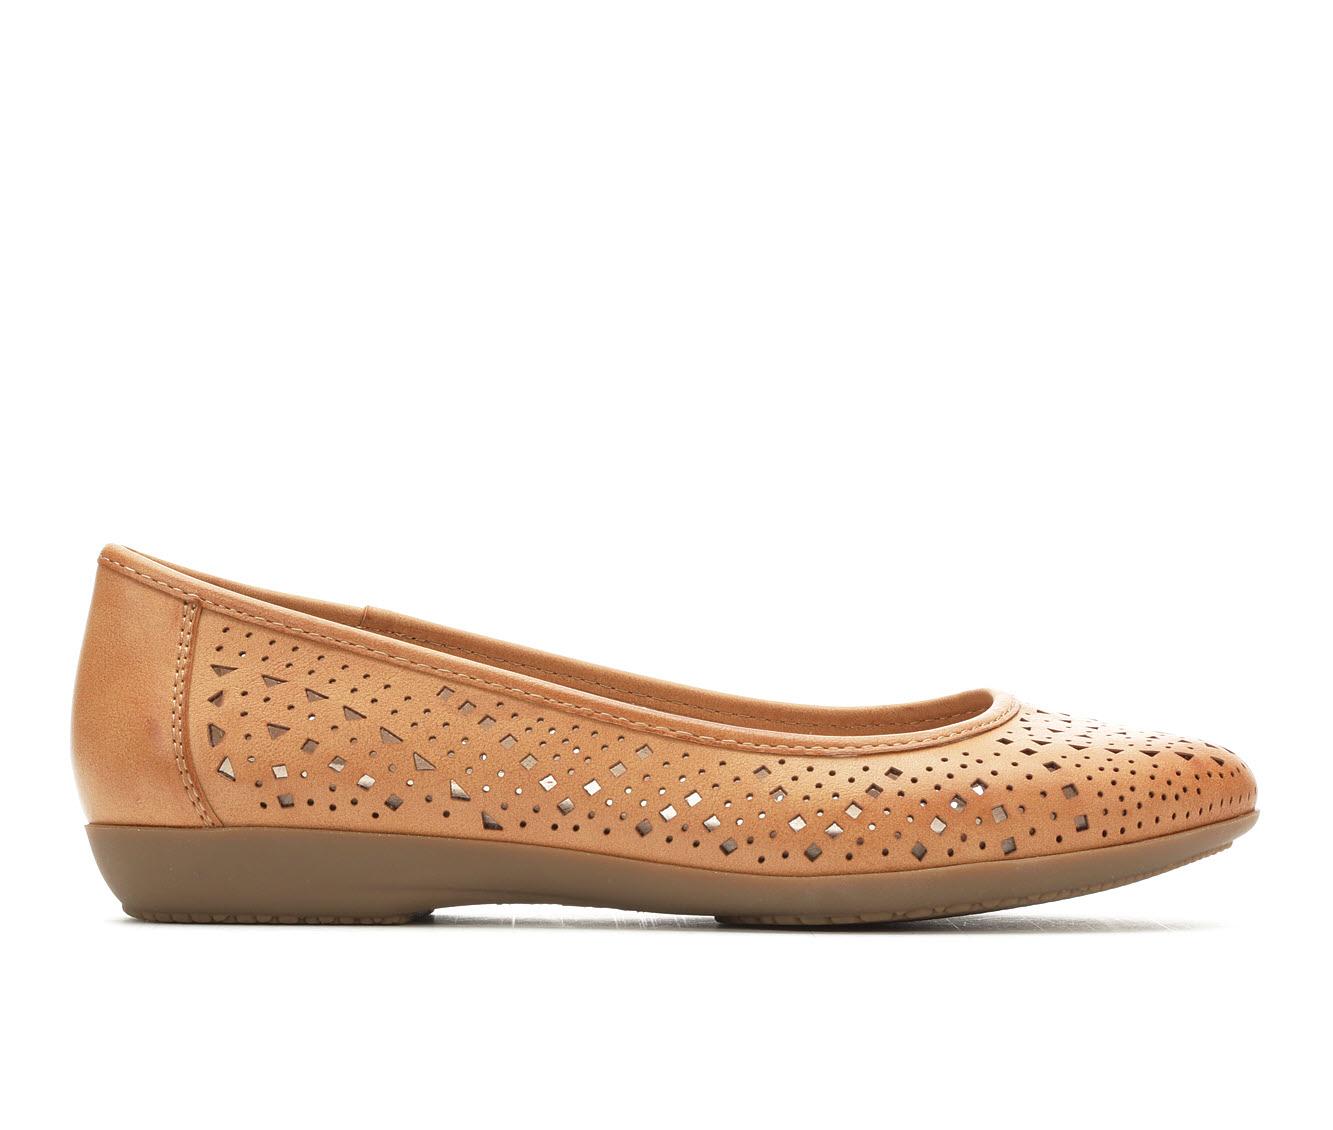 Vintage 7 Eight Claire Women's Shoe (Brown Faux Leather)